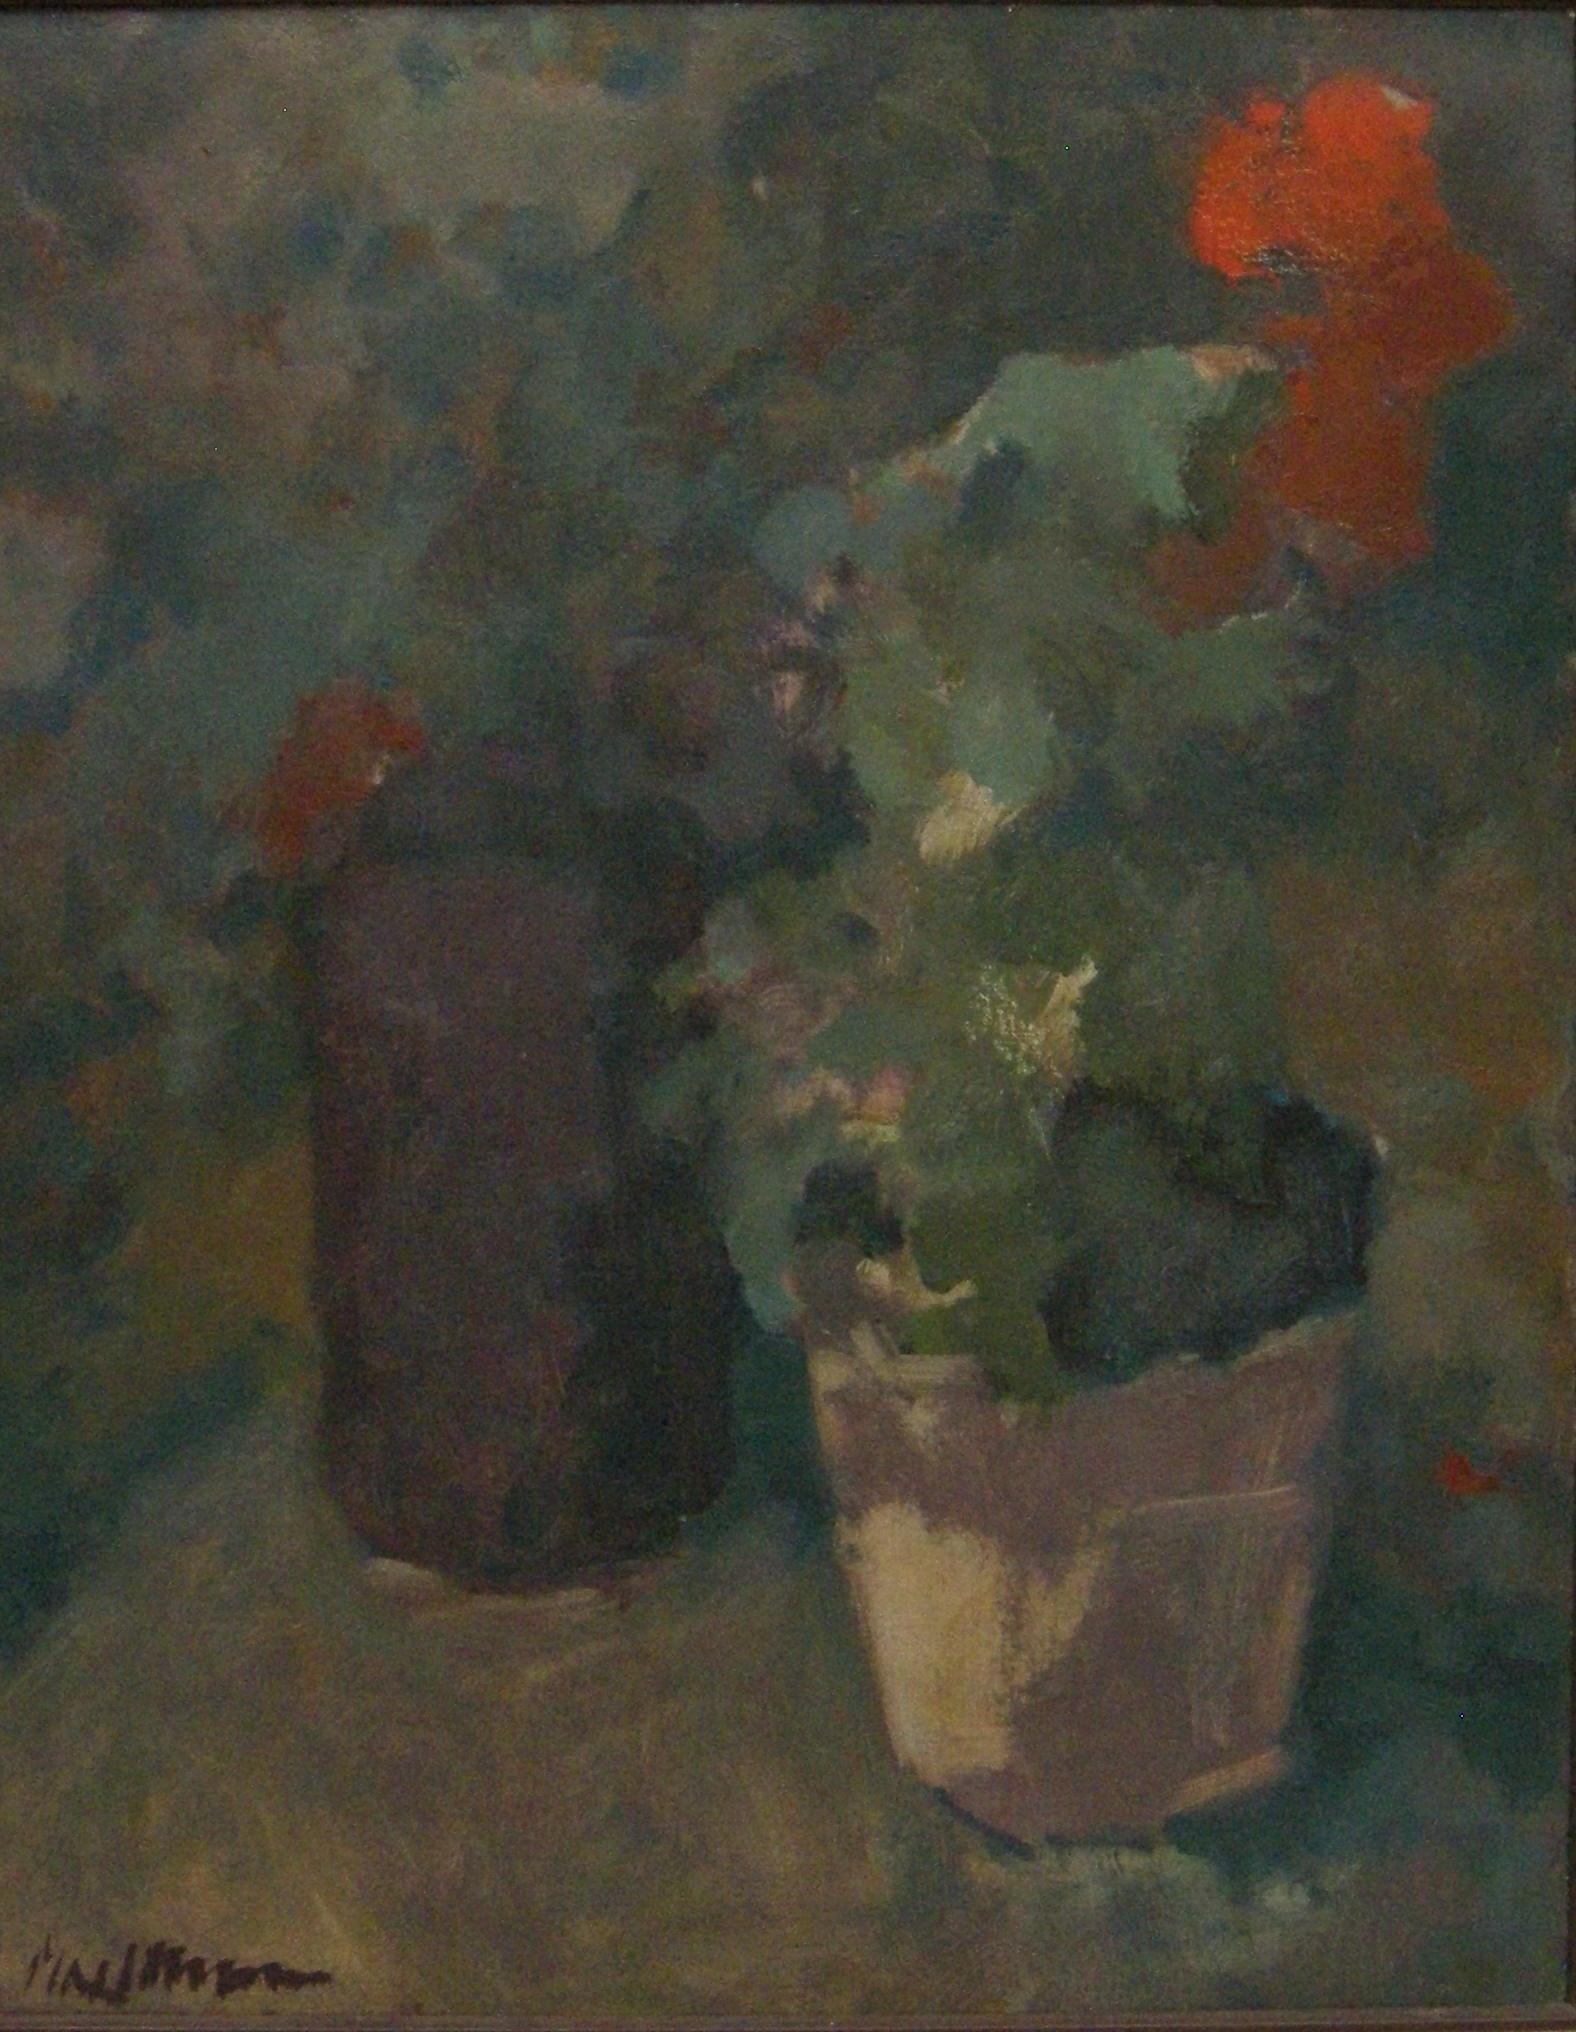 Kleinen  geranium  olieverf op doek  59x45 5cm